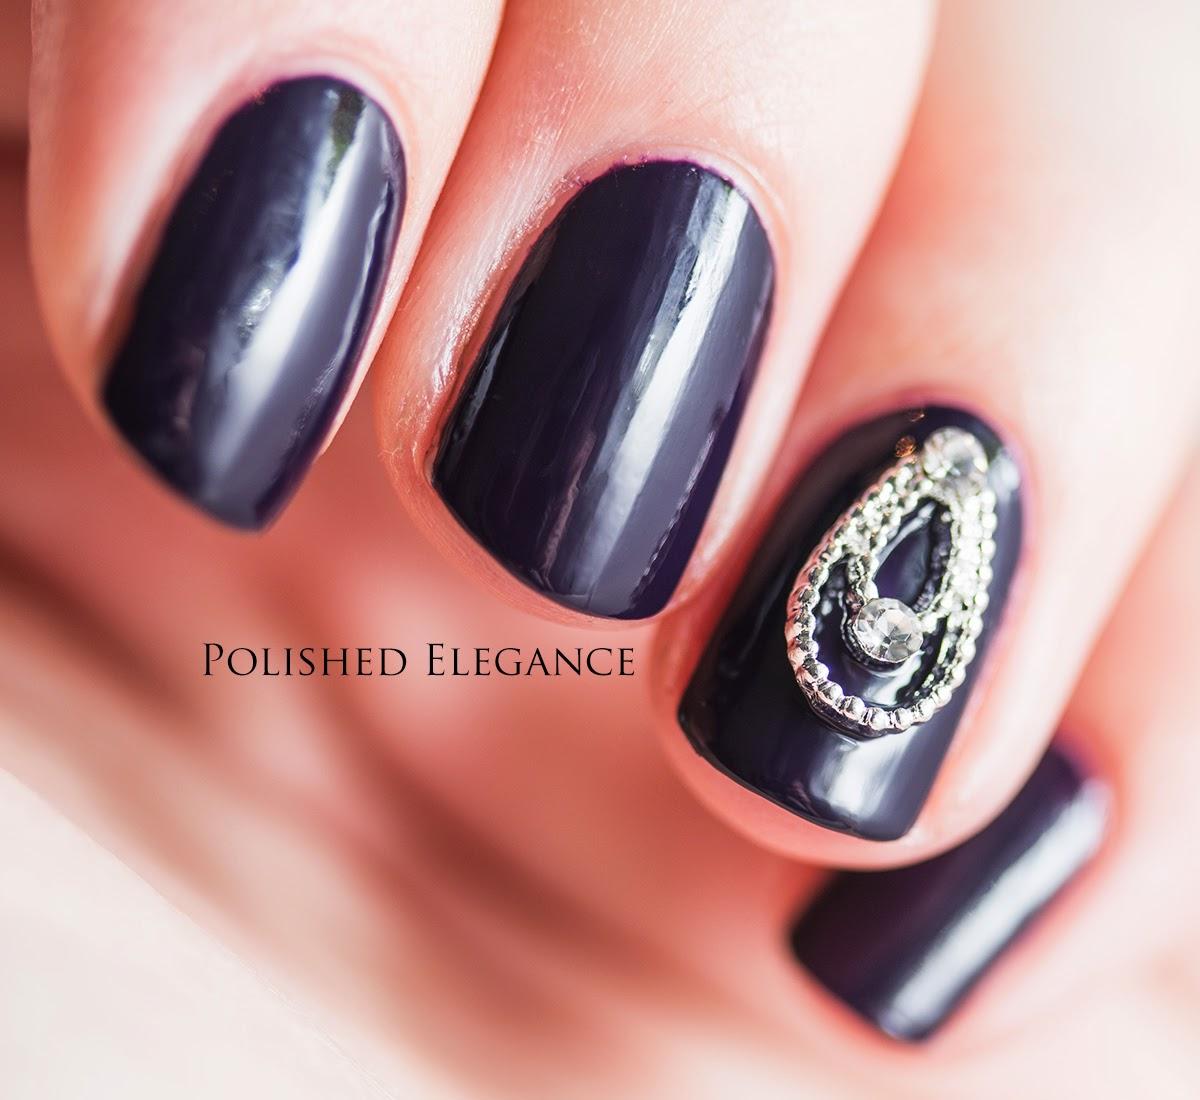 OPI - Viking In A Vinter Vonderland swatch review nail polish 3D bling nail art manciure